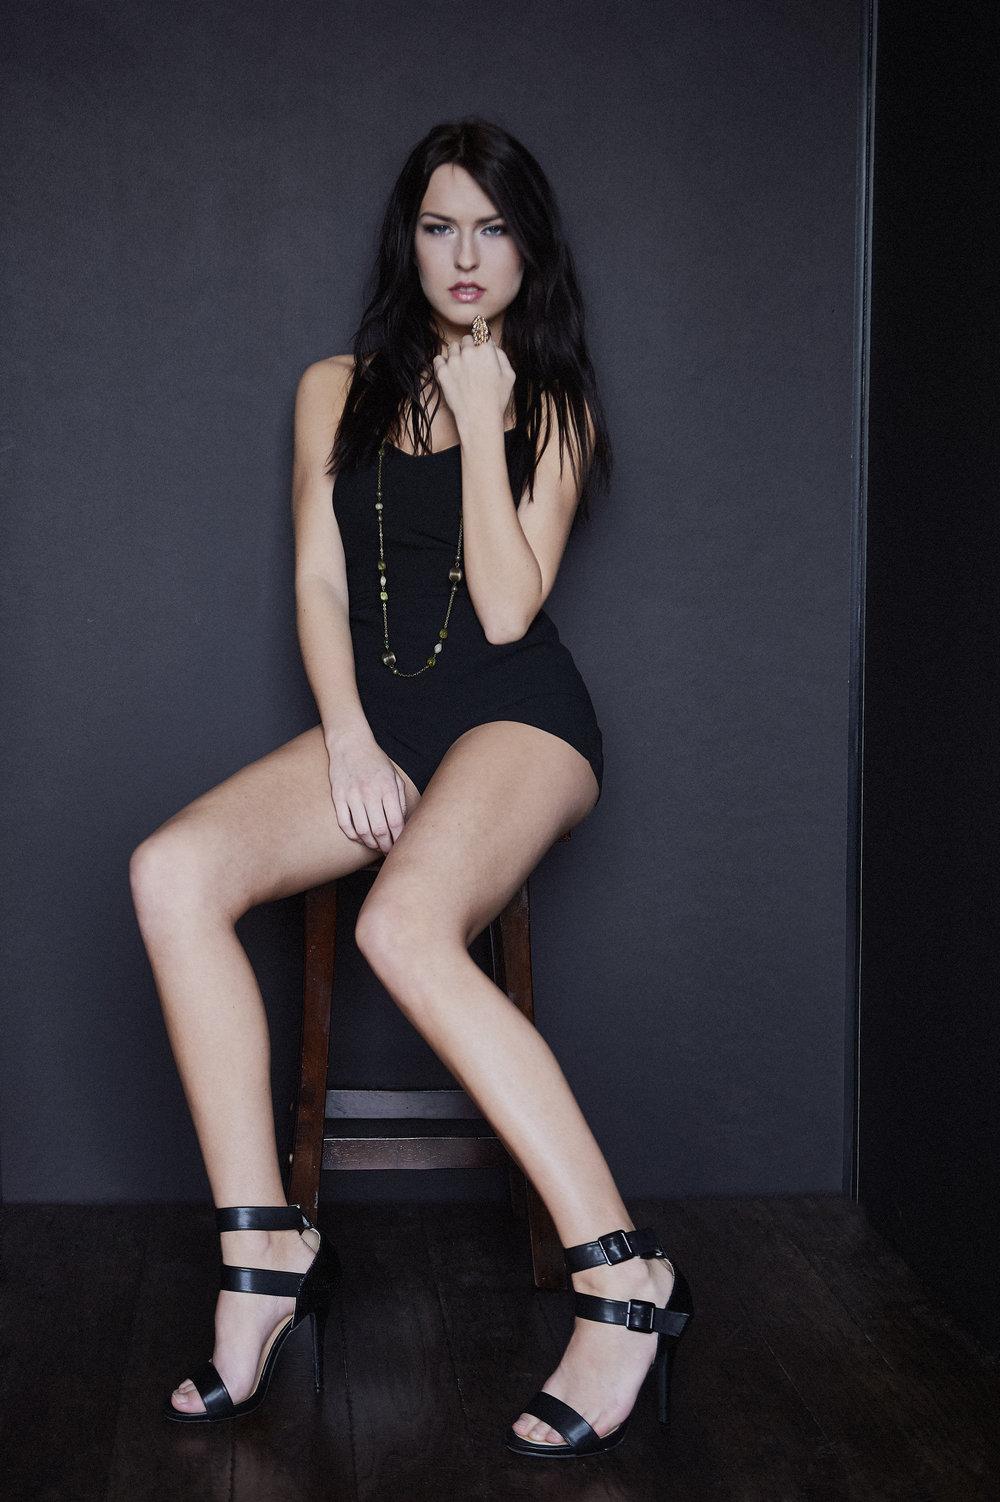 Marta-Hewson - Emily Sorensen - model shoot1934.jpg